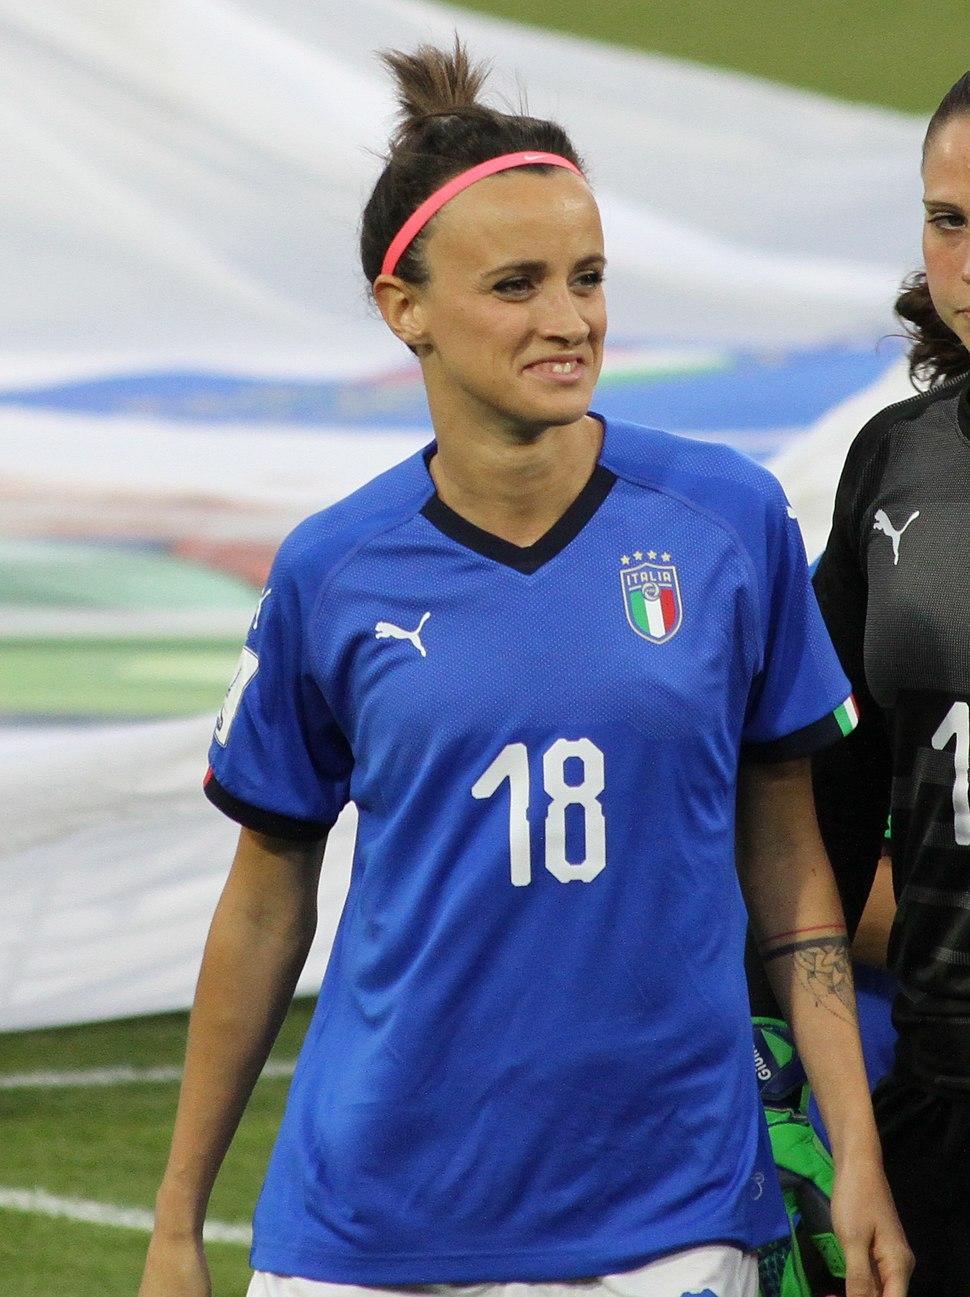 FIFA Women's World Cup Qualification Italy - Belgium, 2018-04-10 9977-001